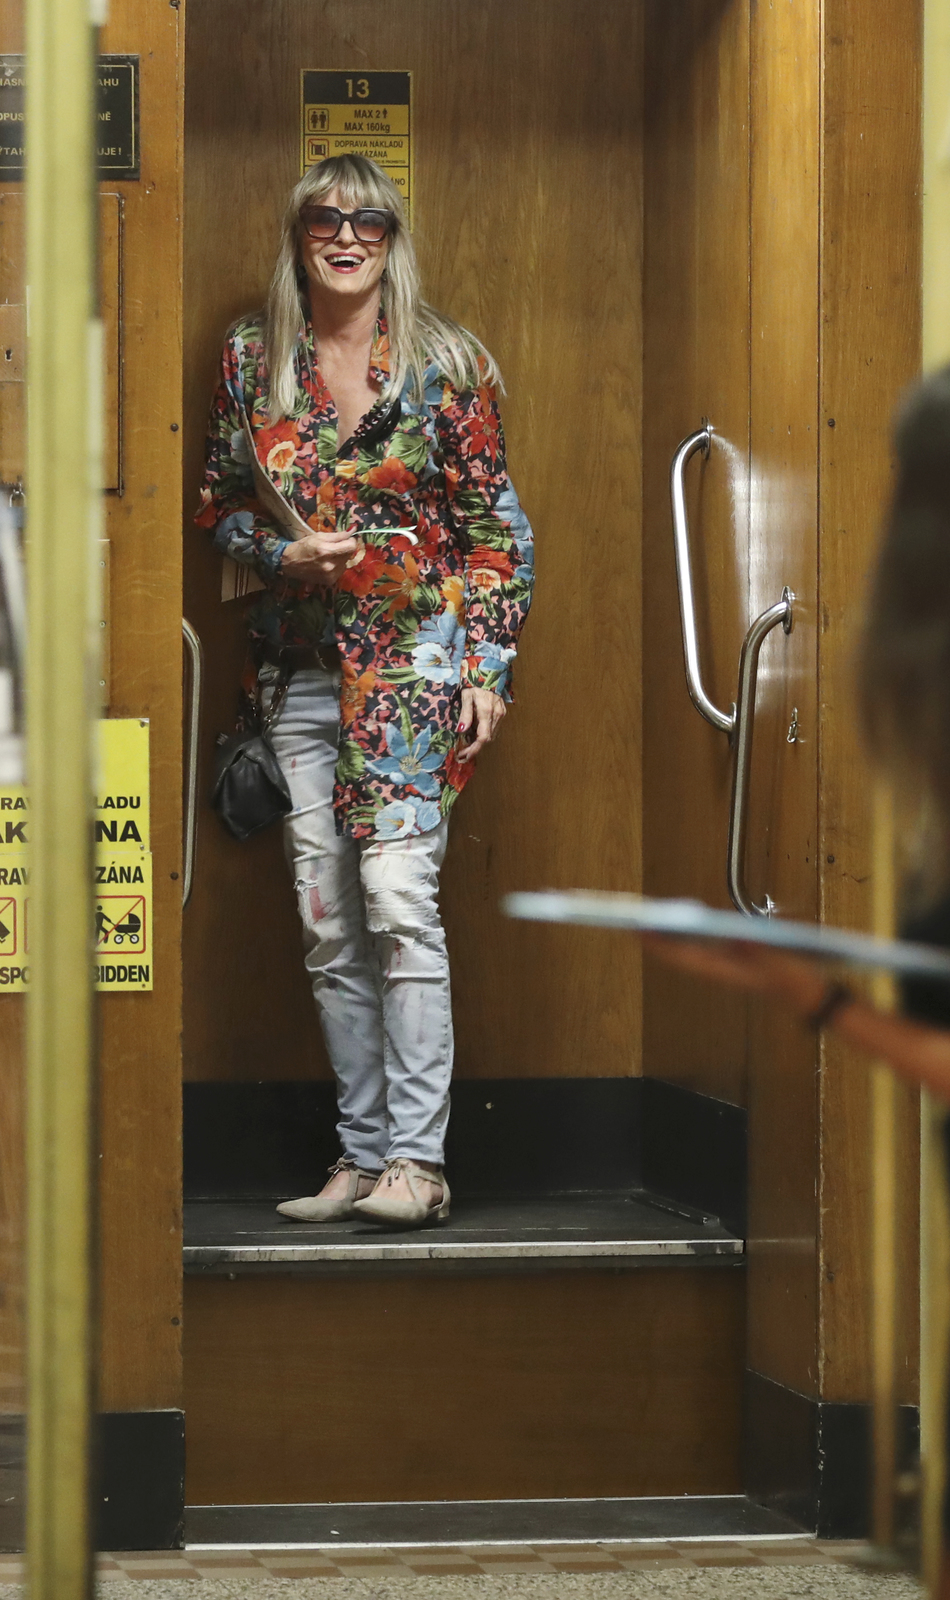 Exmanželka Bolka Polívky Chantal Poullainová brala jízdu výtahem s úsměvem